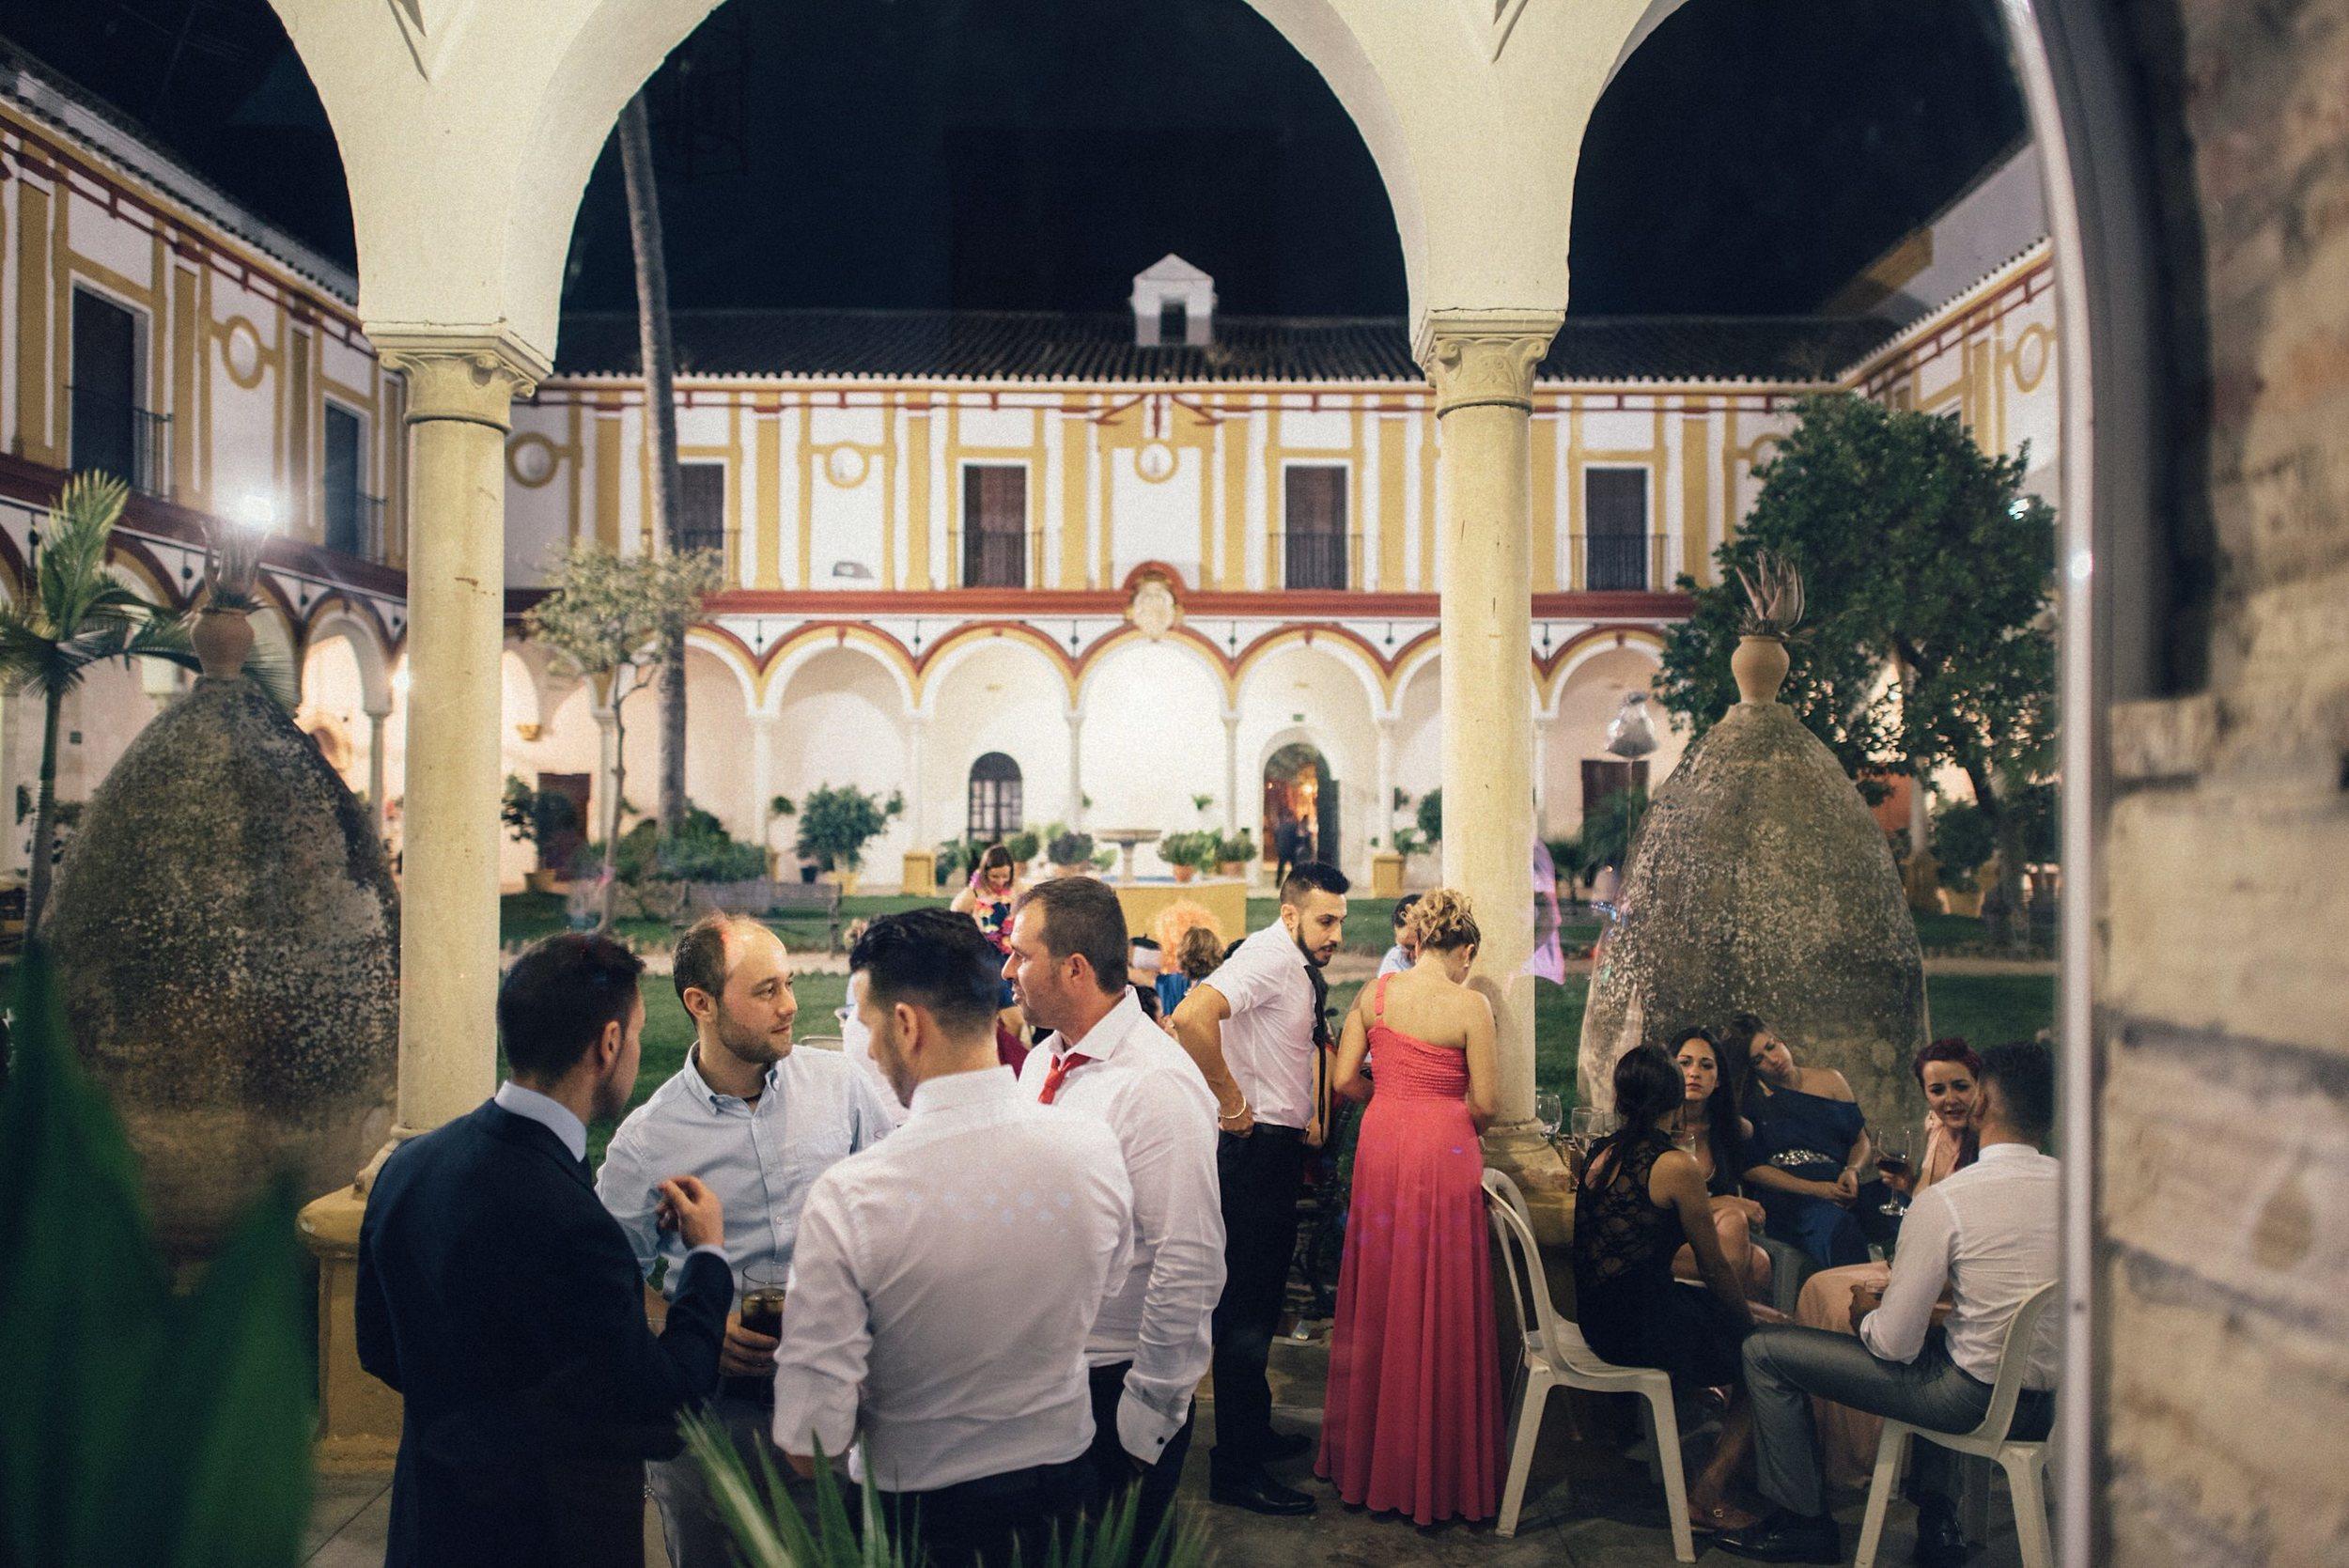 Boda en Utrera - Sevilla - Consolacion - Santuario - Alicia & Jesus DSC_5381exposure.jpg